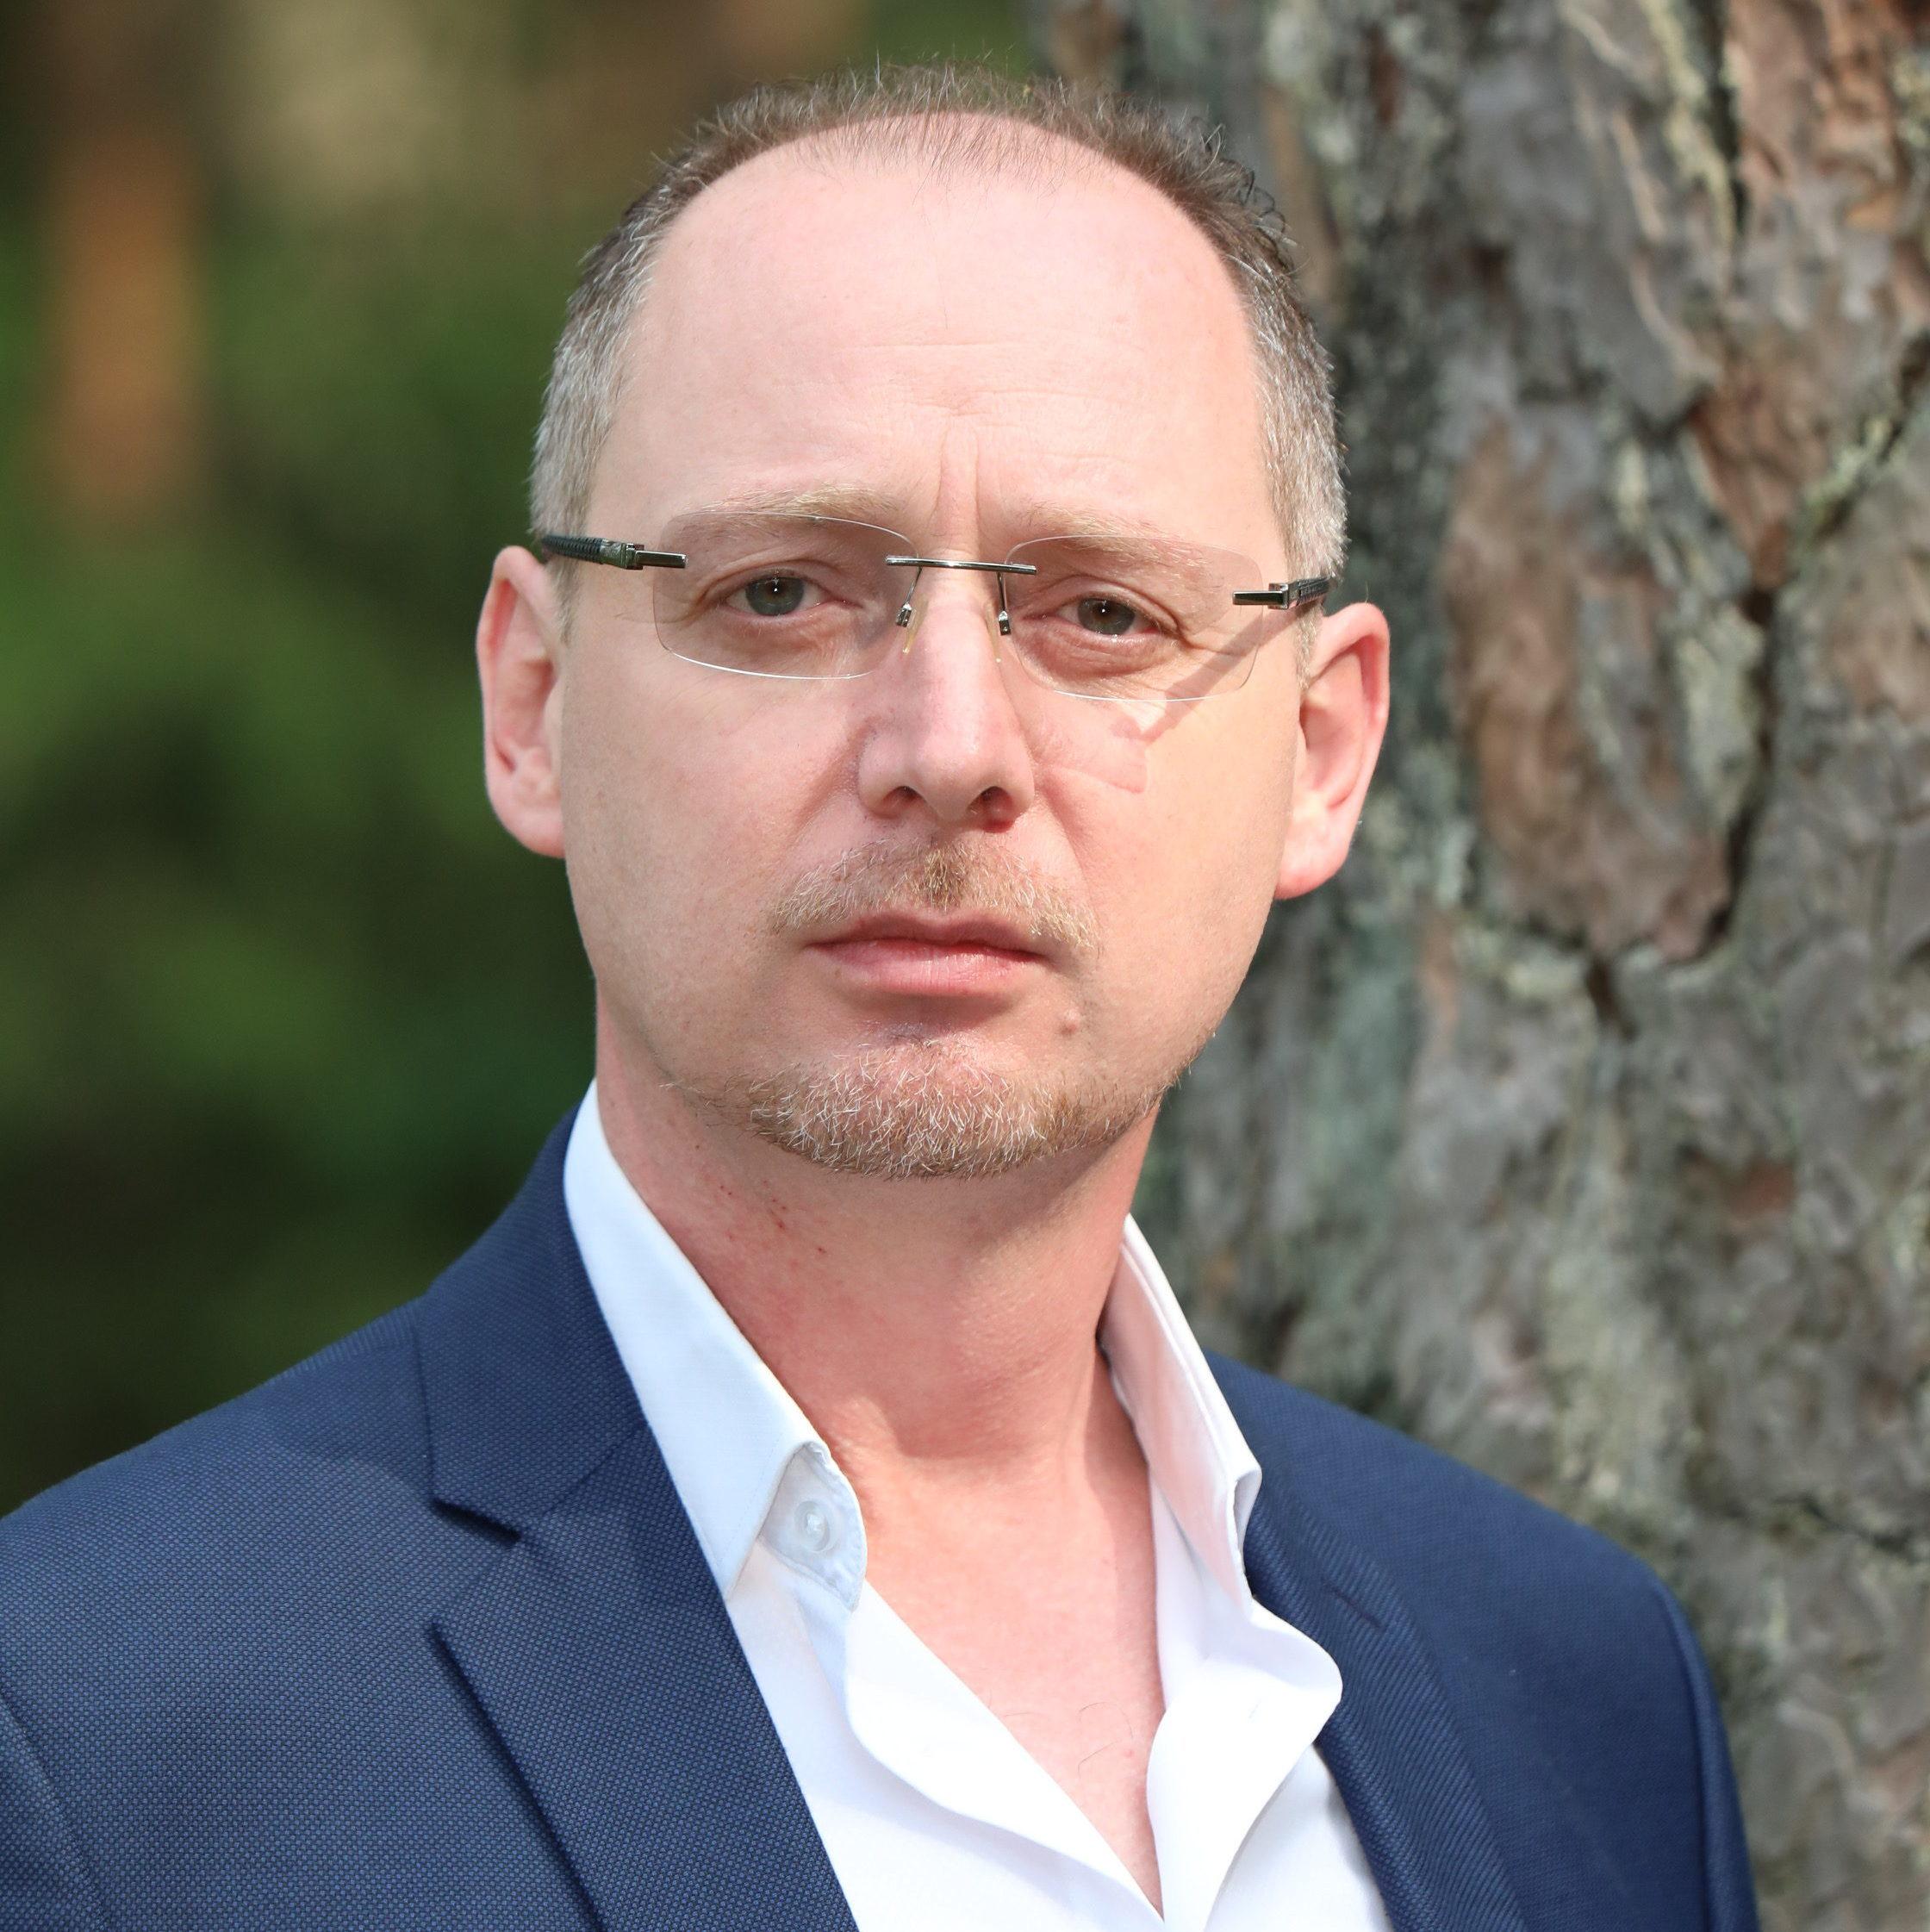 Mr. Gerald Hoppstaedter